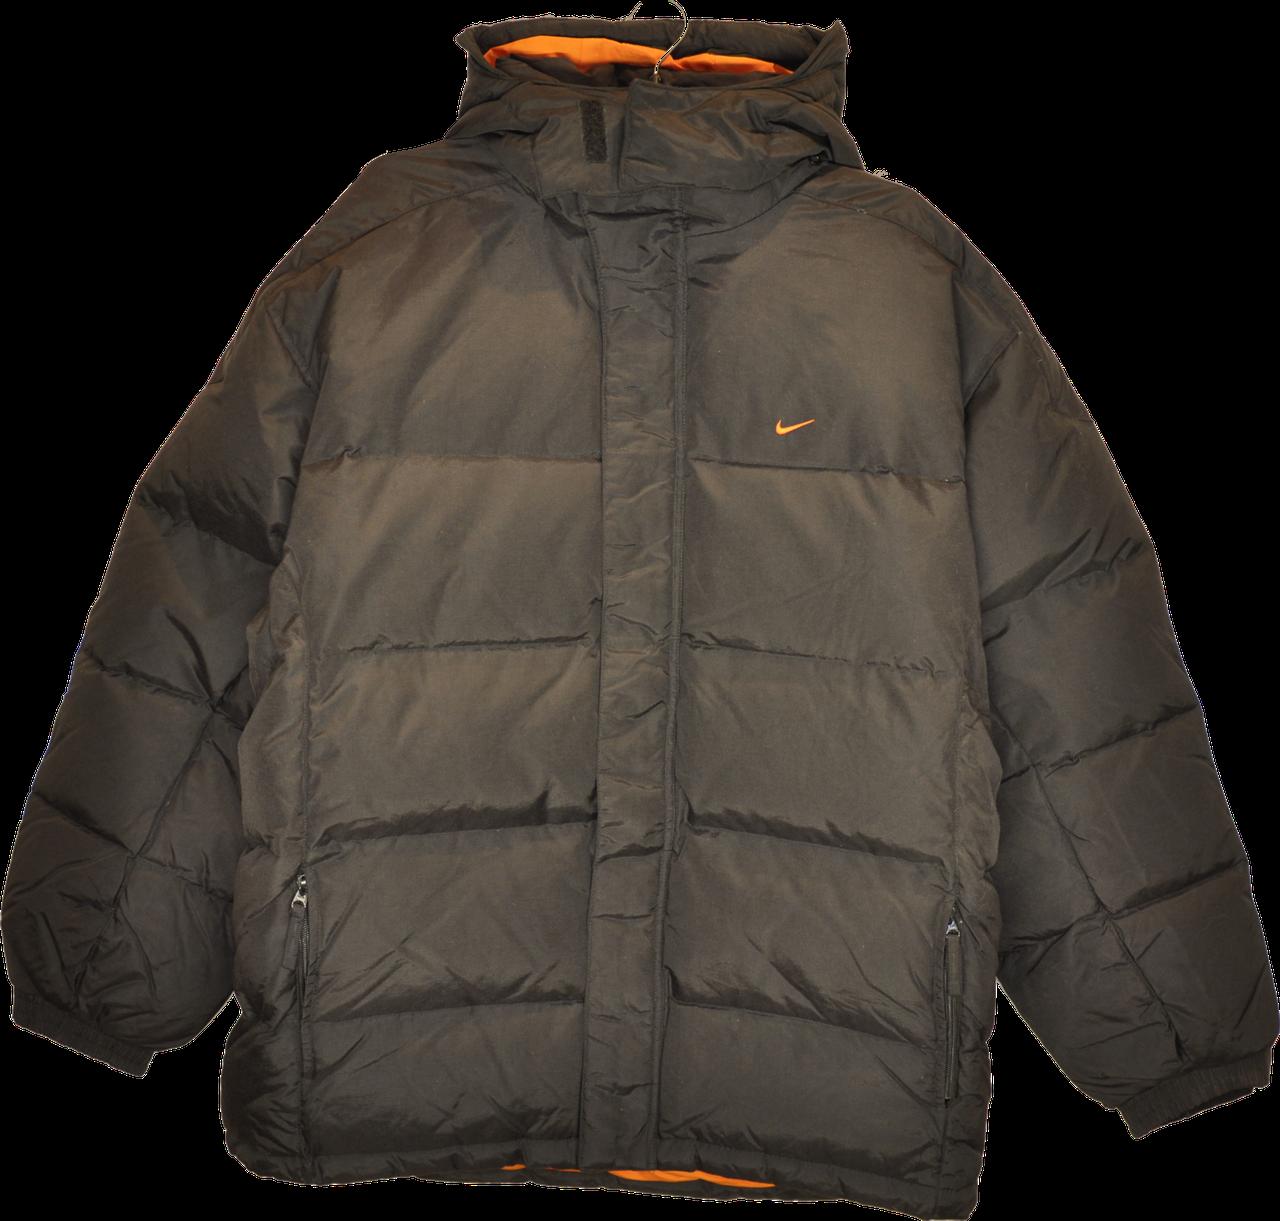 9a7379a0 Мужская спортивная зимняя куртка Nike.: продажа, цена в Киеве ...